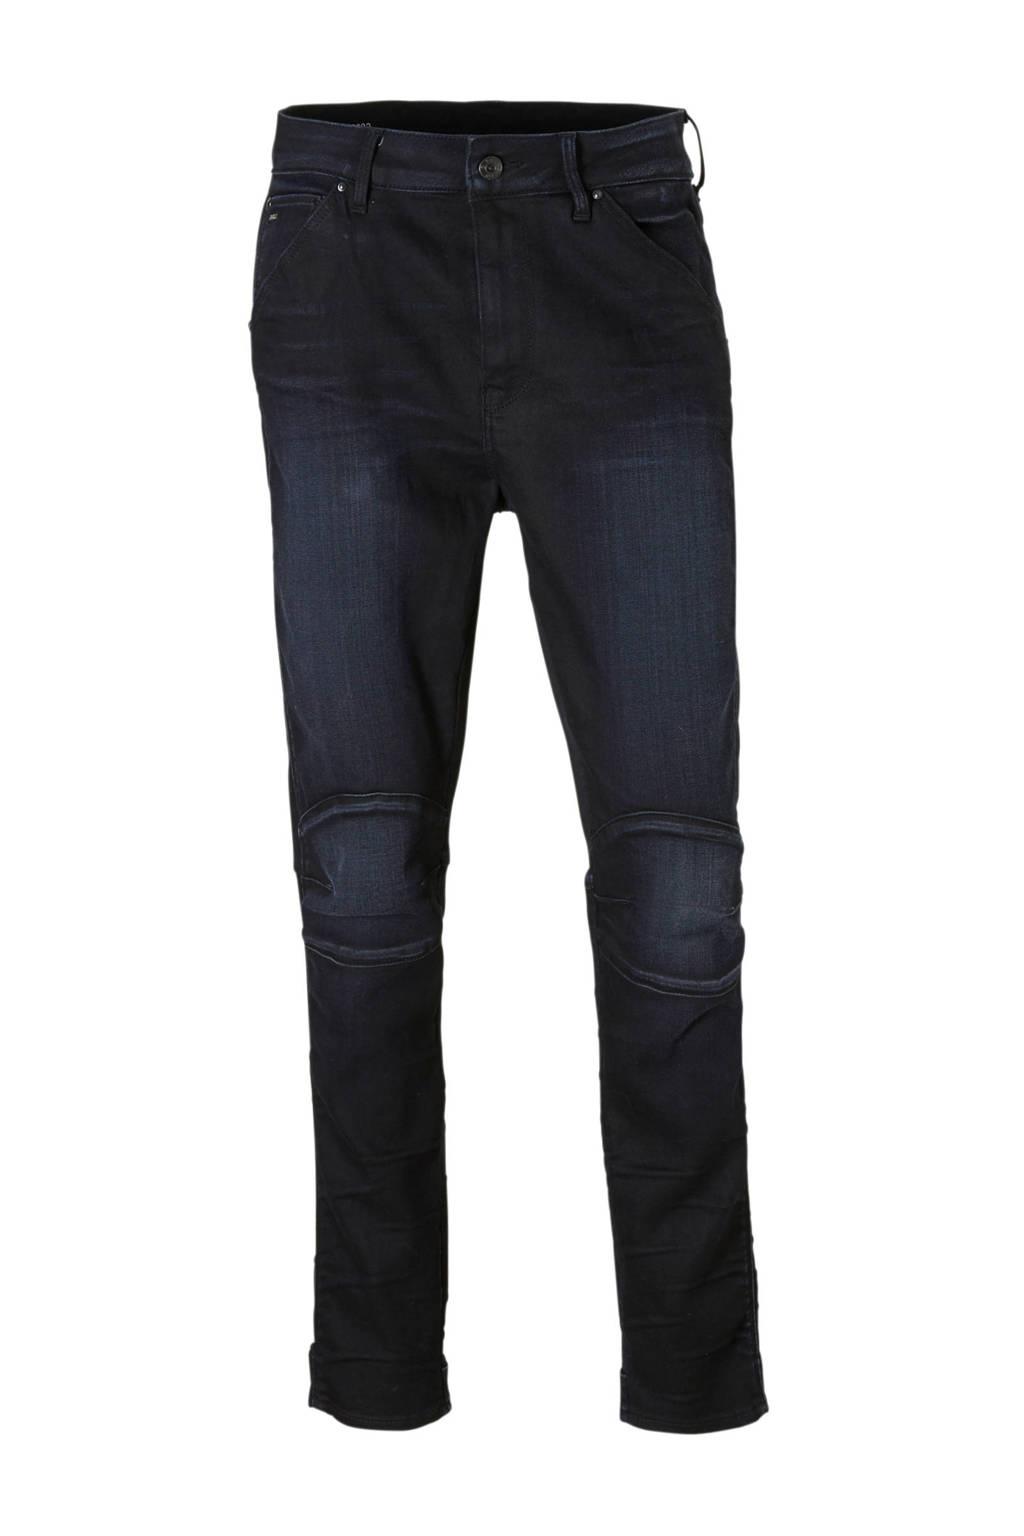 G-Star RAW slim fit jeans, Donkerblauw